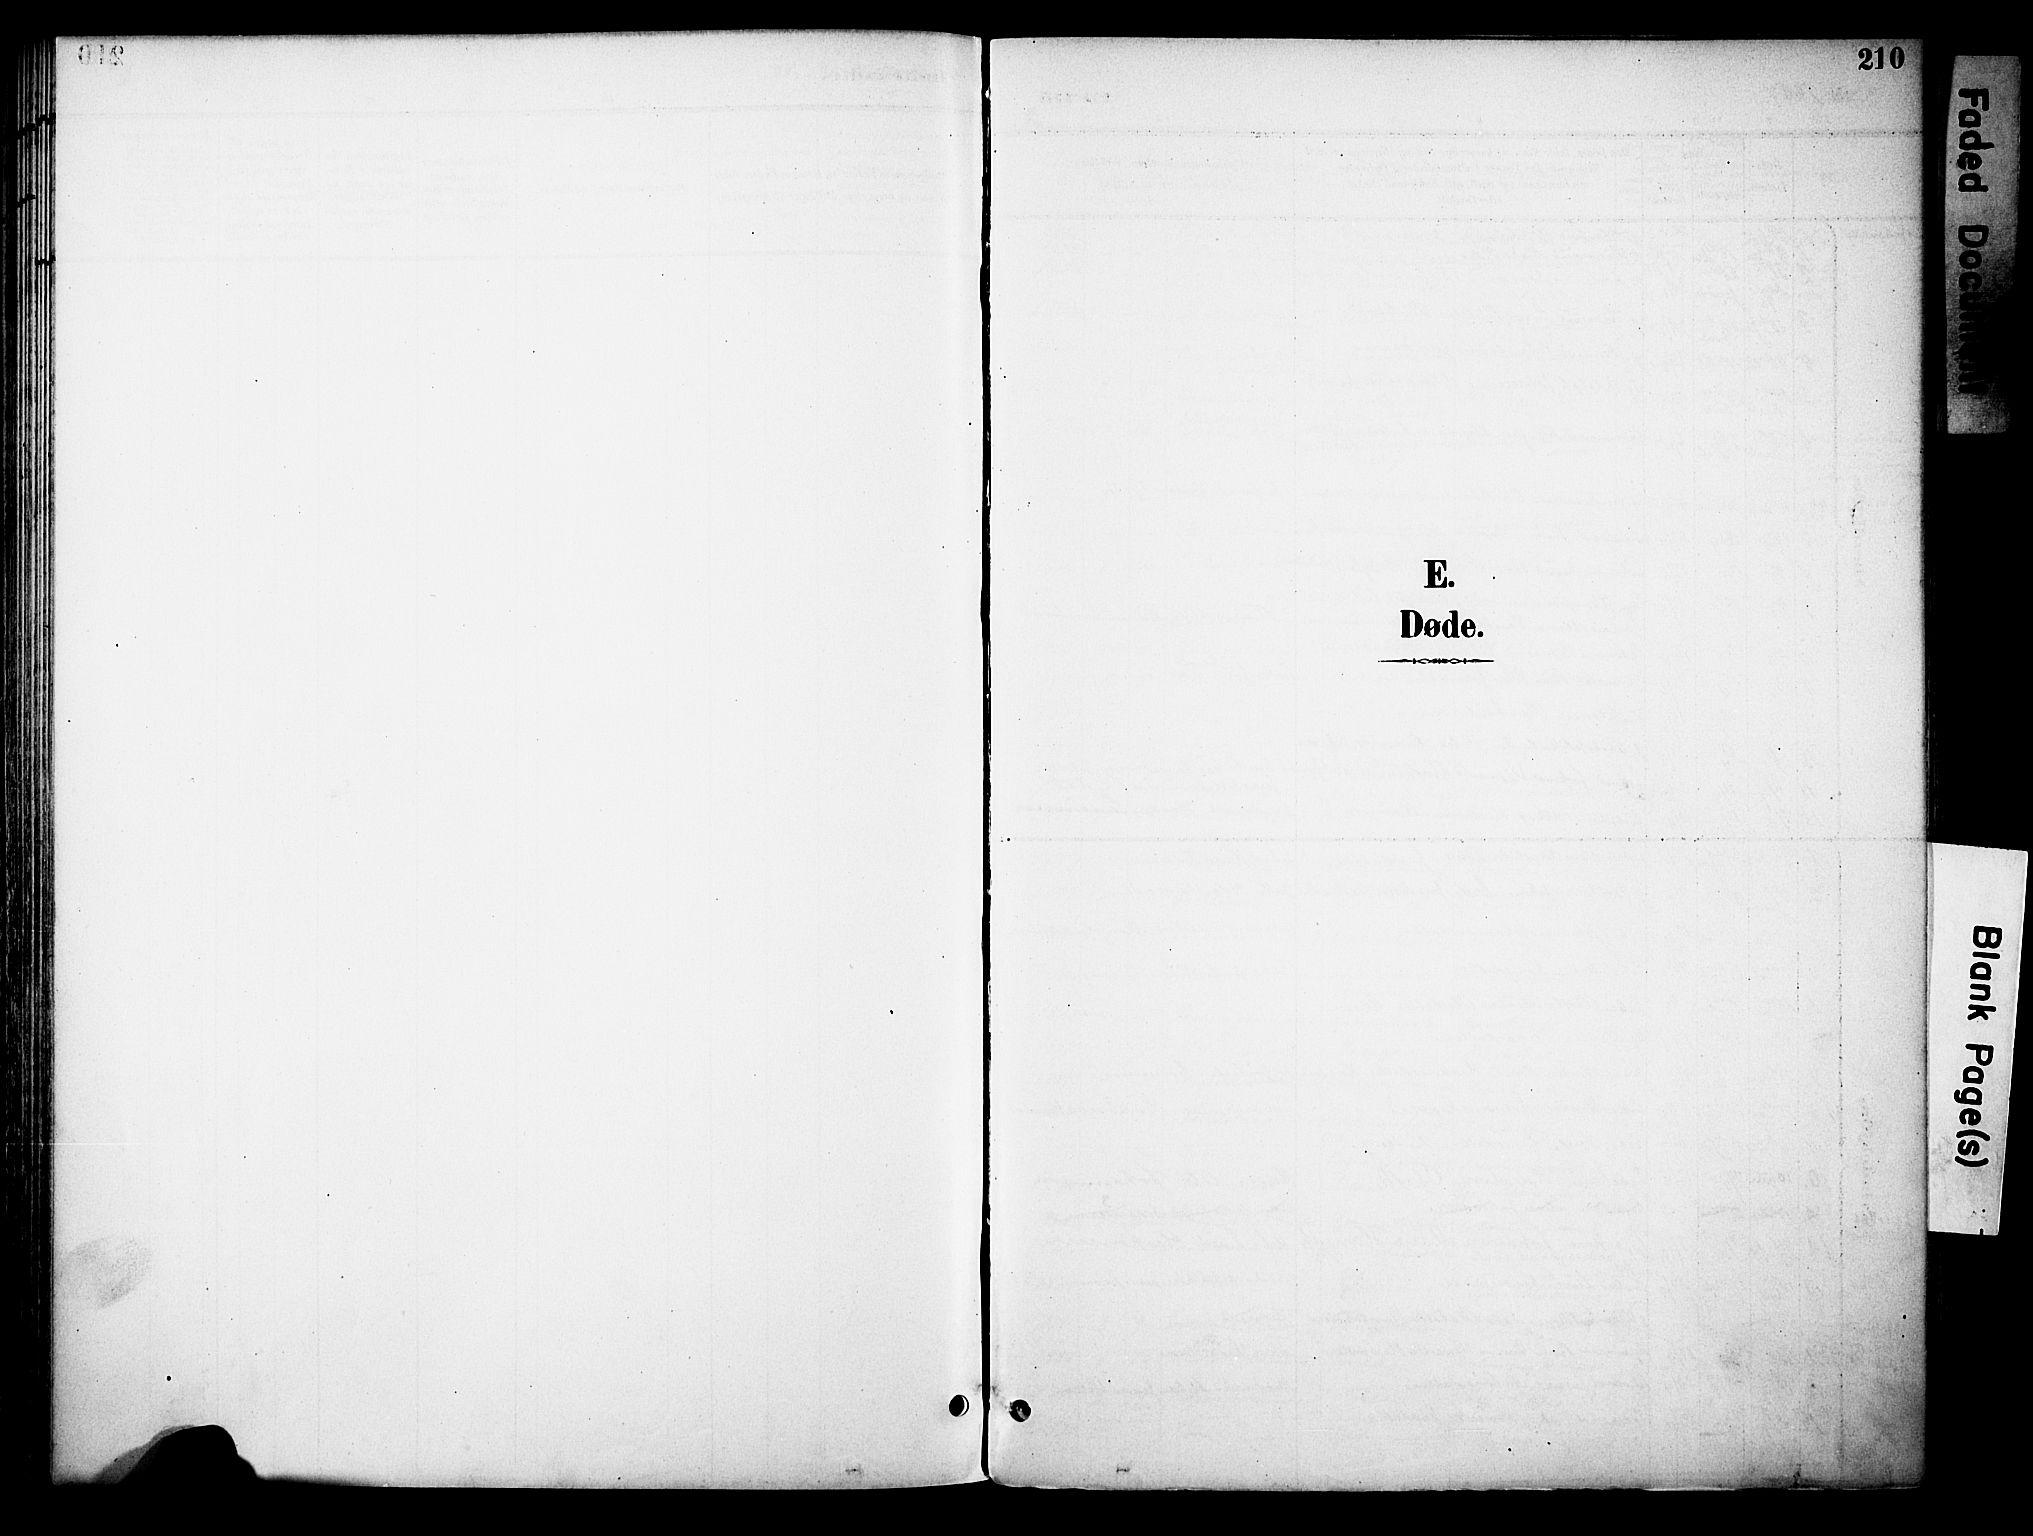 SAH, Østre Toten prestekontor, Ministerialbok nr. 9, 1897-1913, s. 210